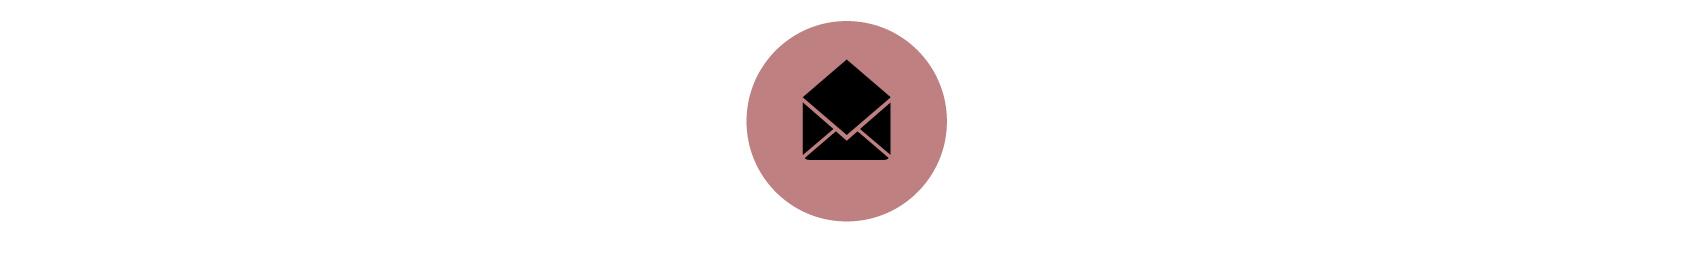 mail meer info gifts vanaf 10 euro